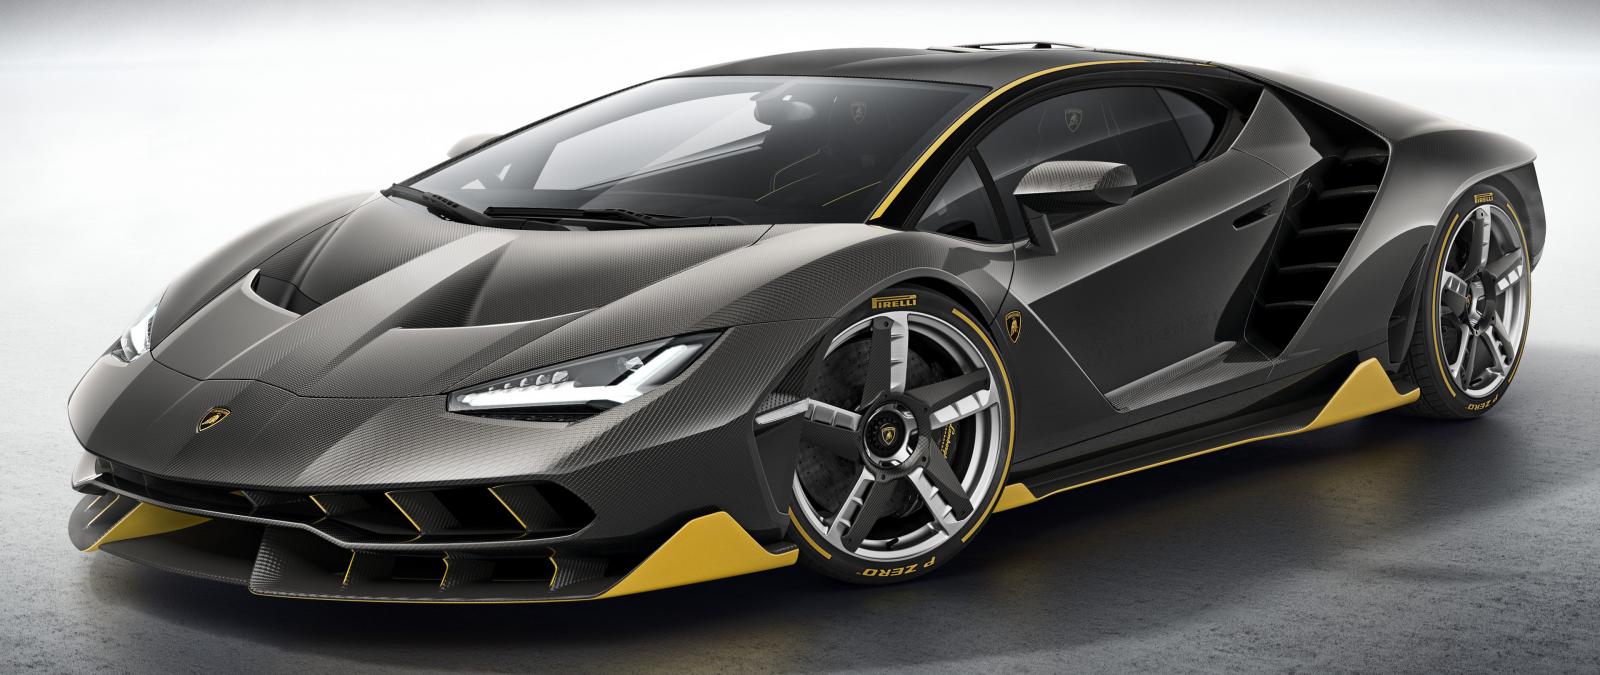 fond d 39 cran v hicule lamborghini aventador super voiture voiture de sport voiture. Black Bedroom Furniture Sets. Home Design Ideas